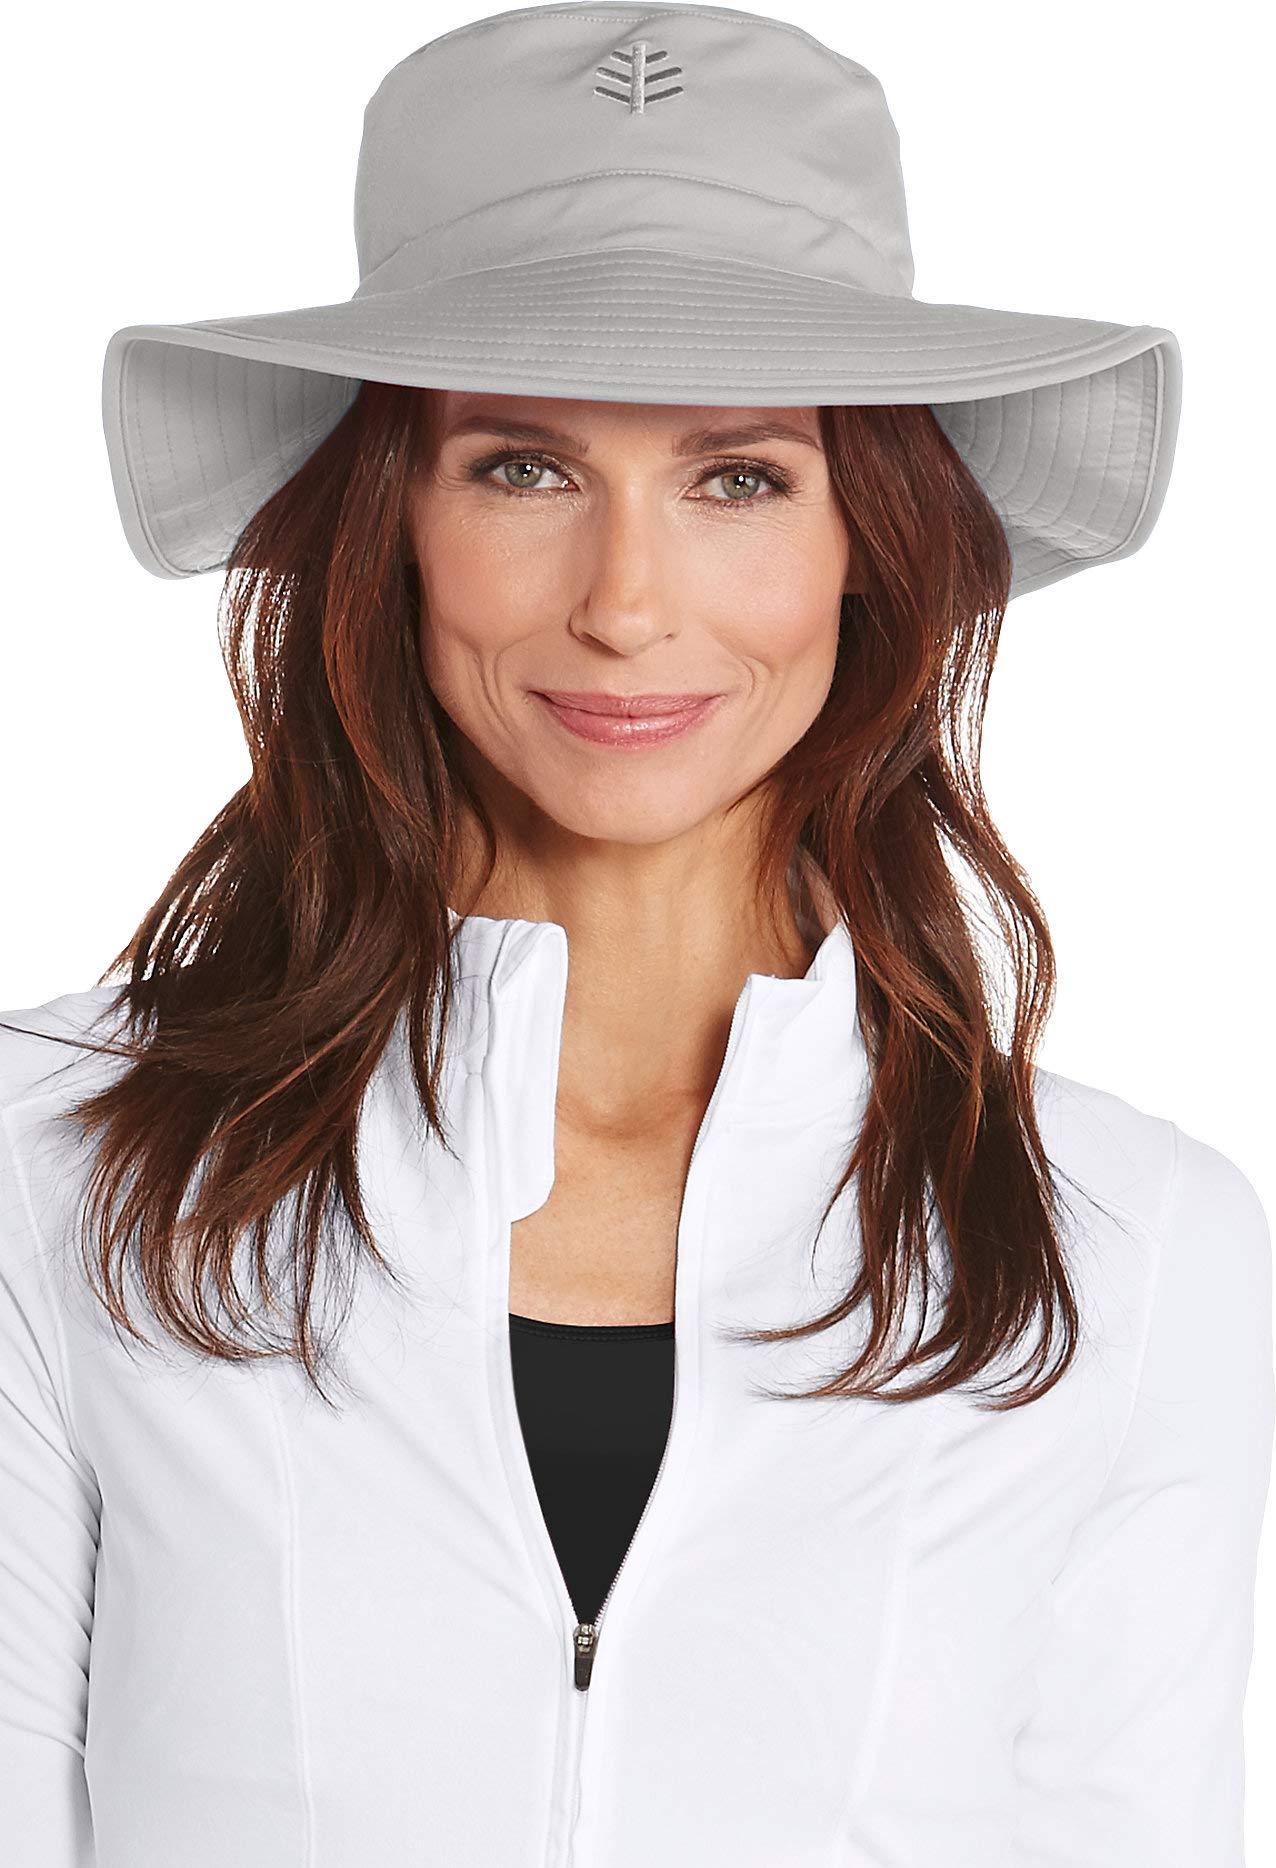 Coolibar UPF 50+ Women's Chlorine Resistant Bucket Hat - Sun Protective (Small/Medium- Mercury)